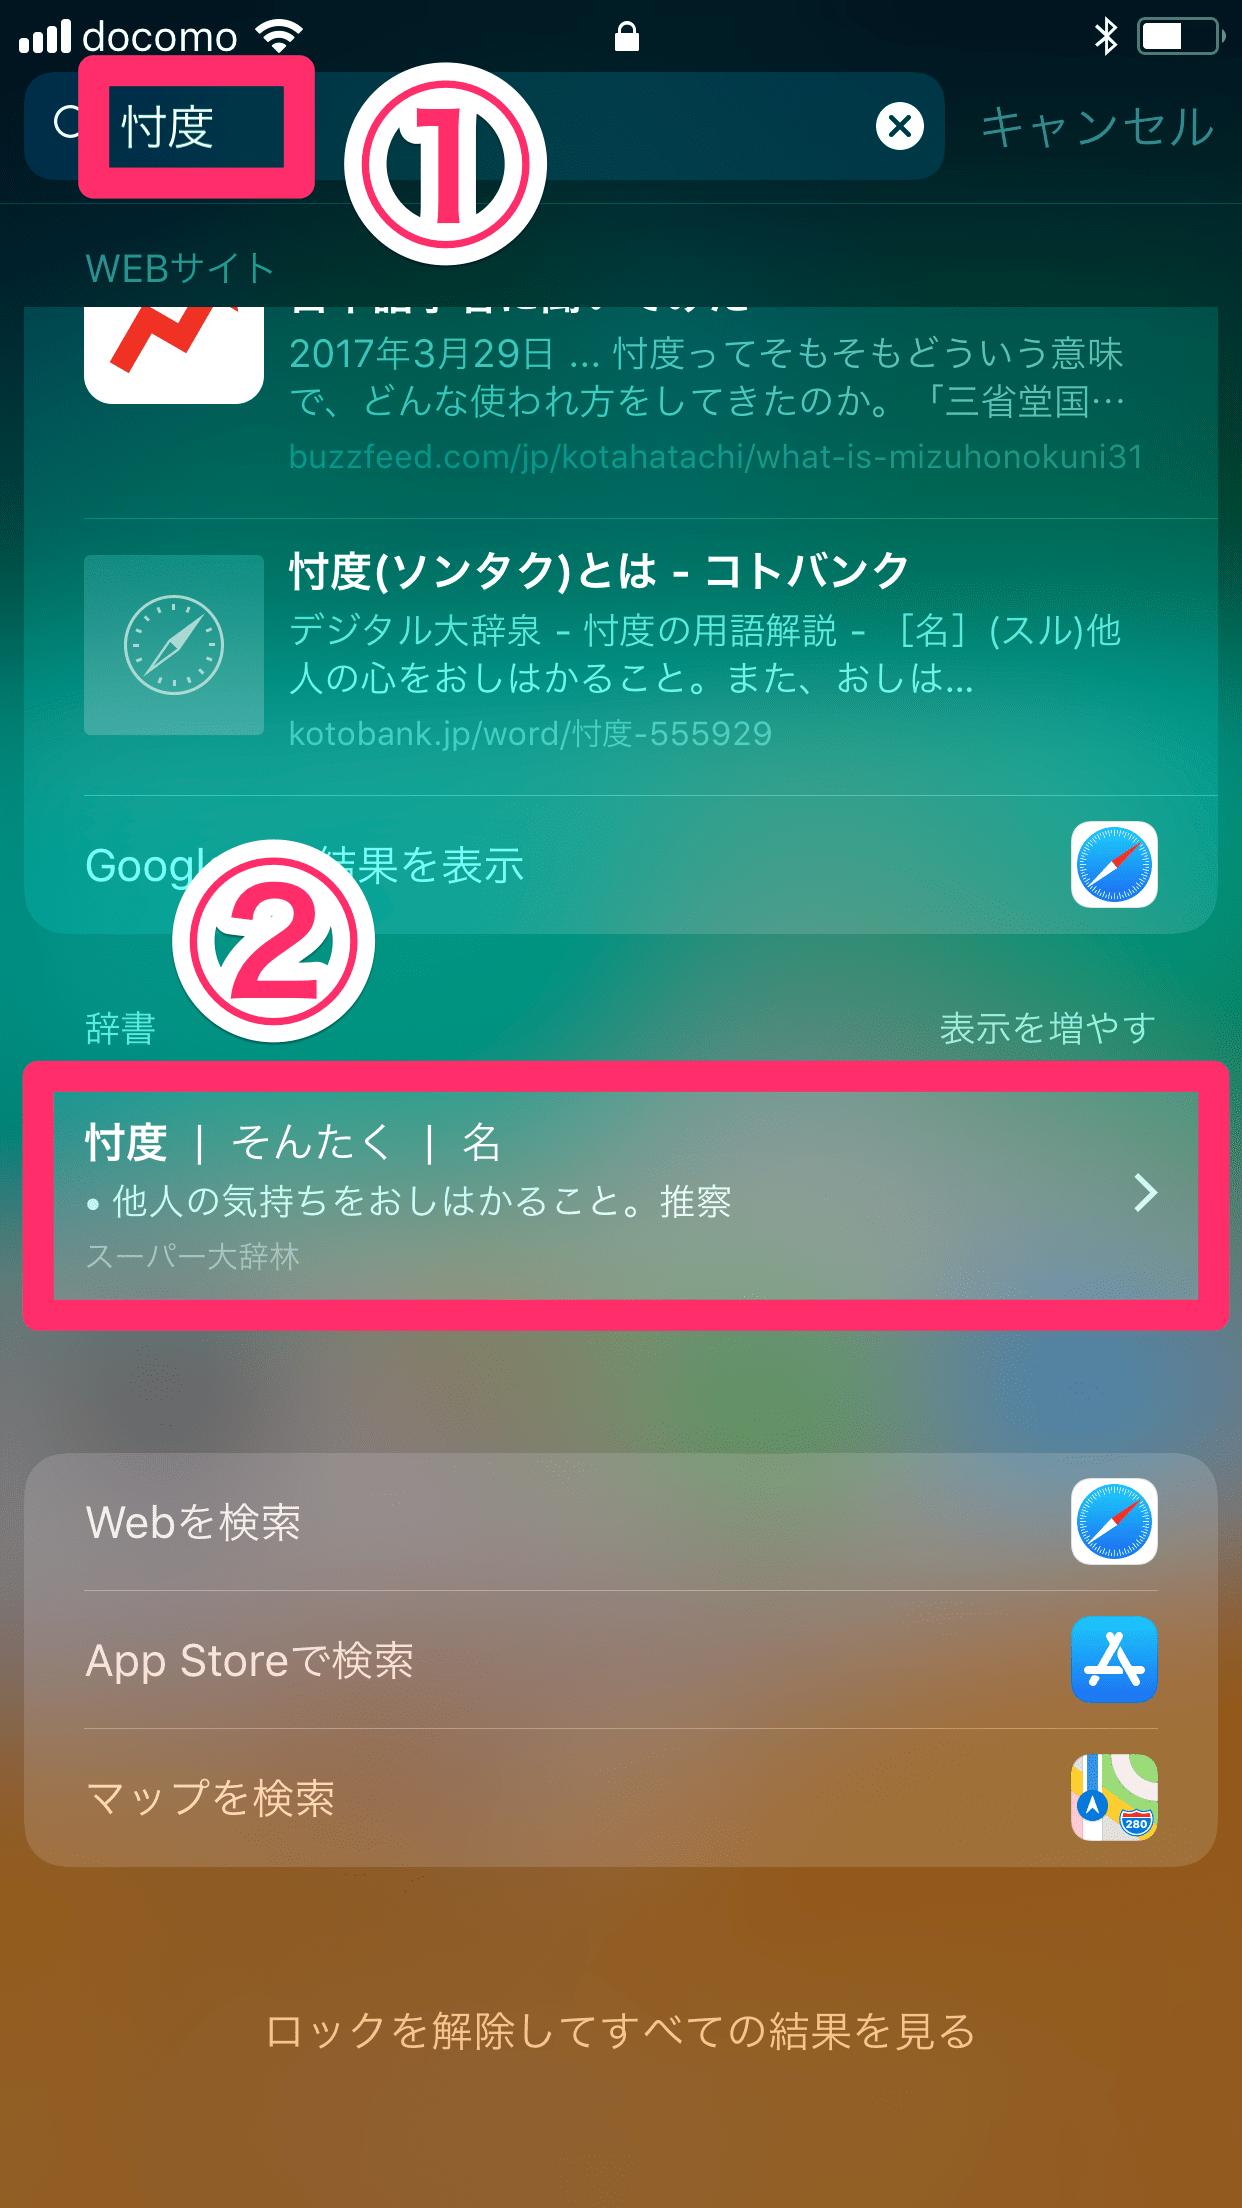 iOS 11/iPhone 8:Spotlight検索での計算・単位換算・辞書